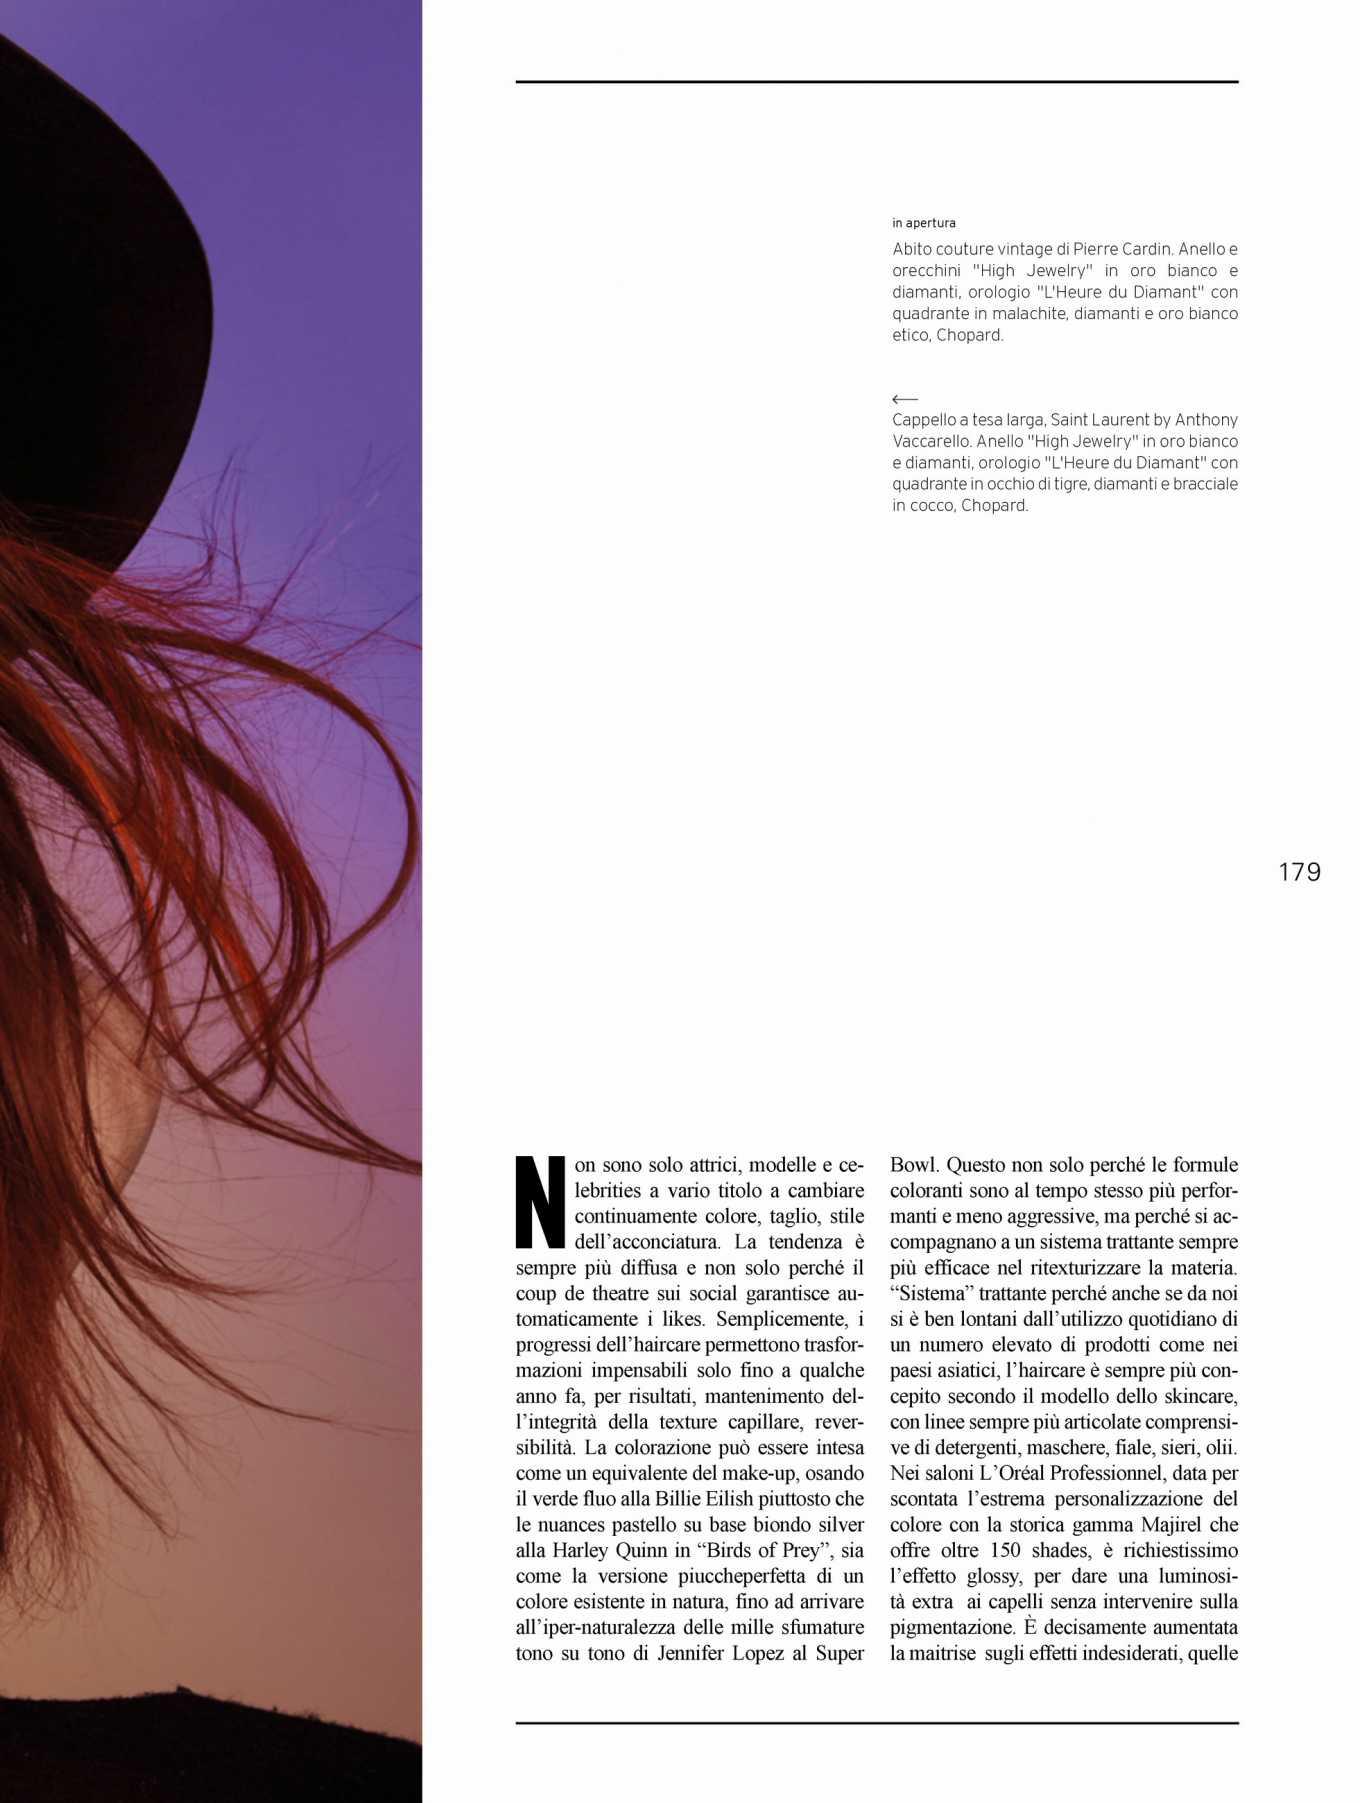 Julianne Moore 2020 : Julianne Moore – LOfficiel magazine (Italia – February 2020)-08